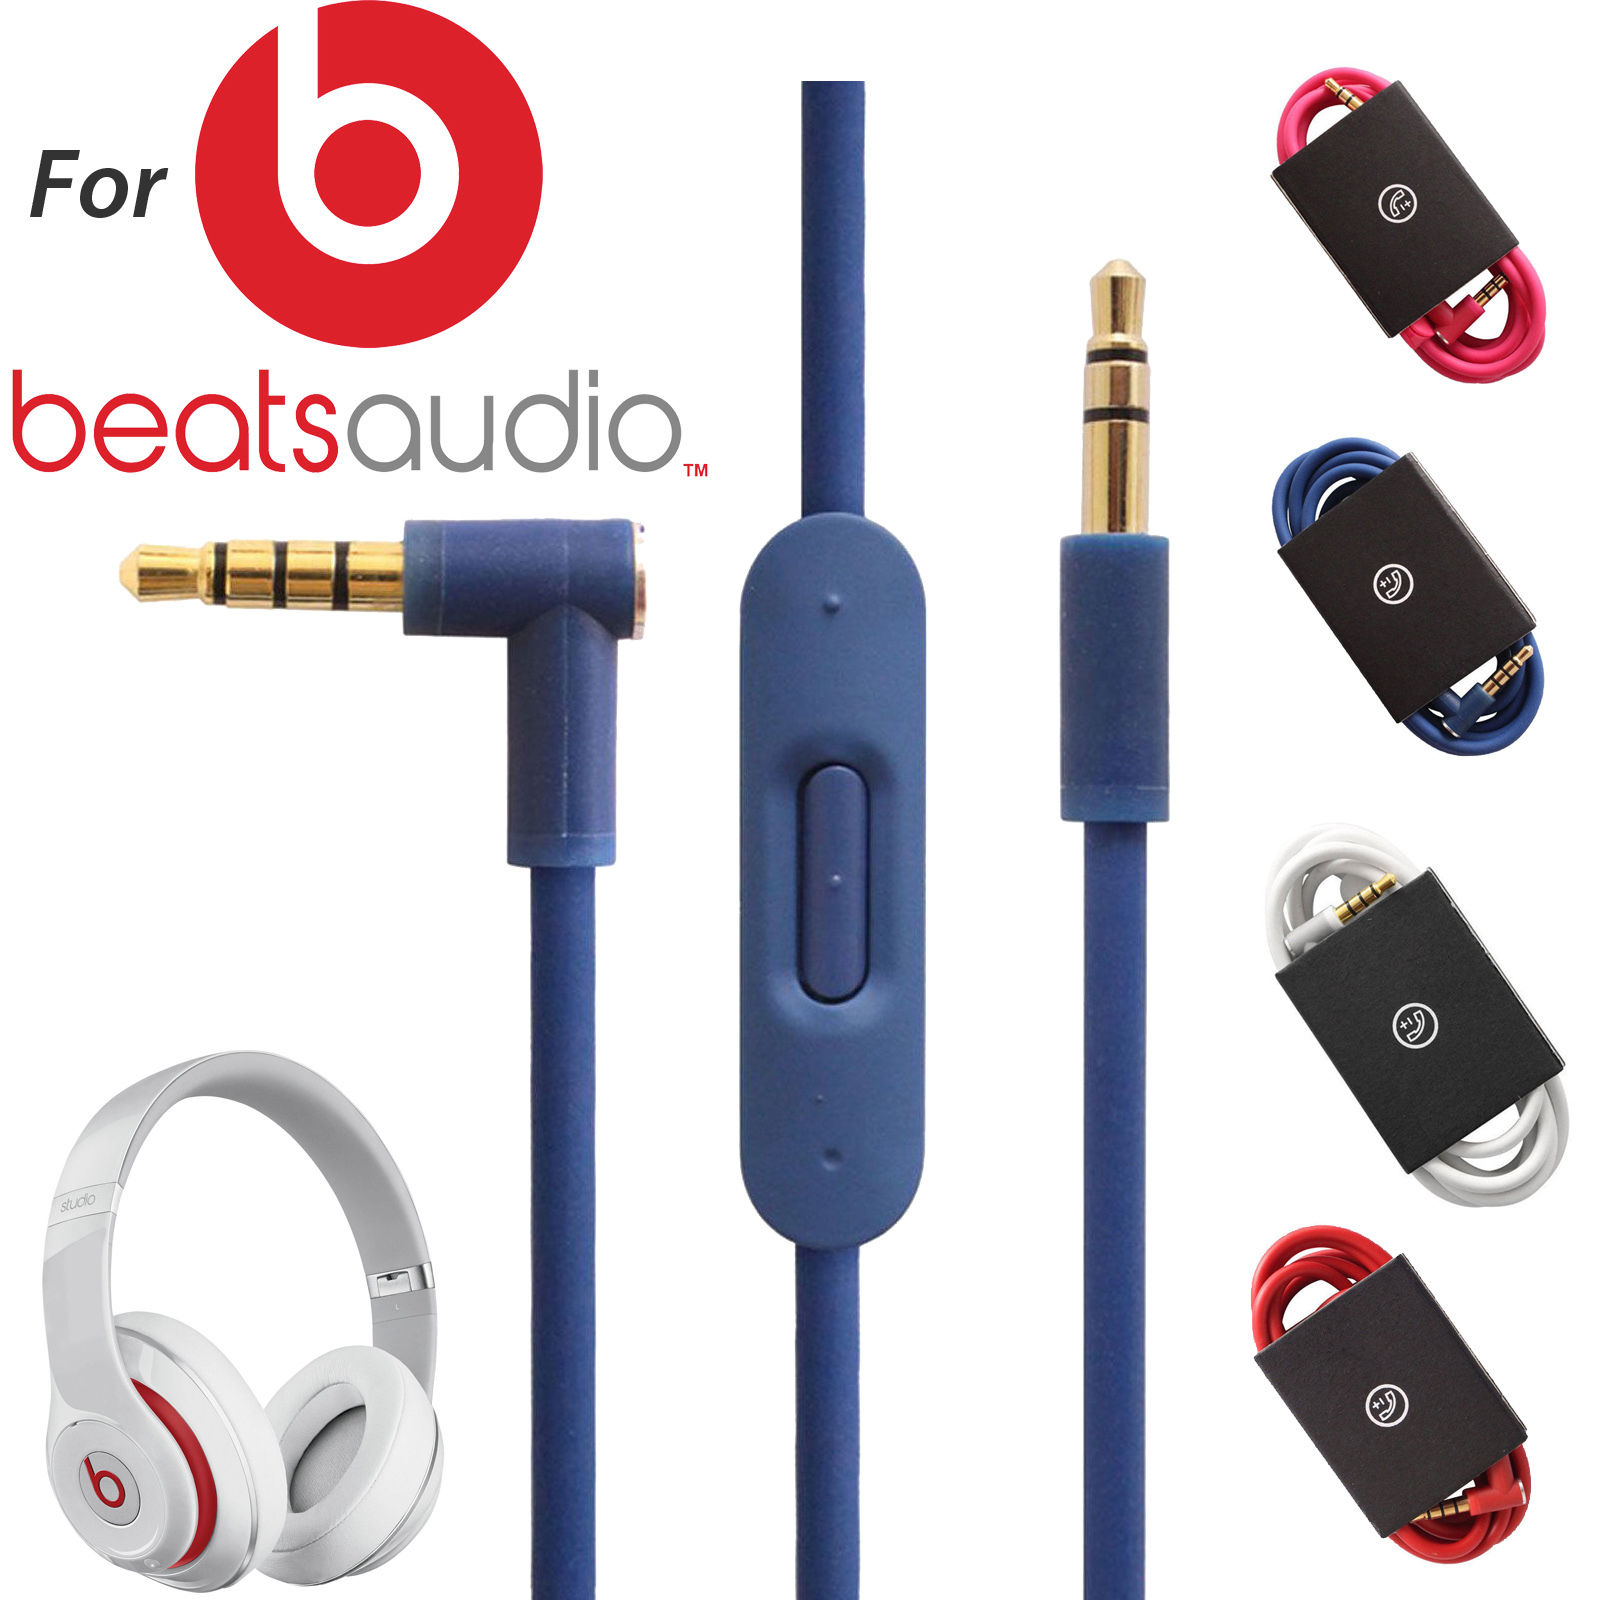 hight resolution of ipod headphone wiring diagram wiring diagramipod headphone wiring colors best wiring librarydre headphones wire colors wire